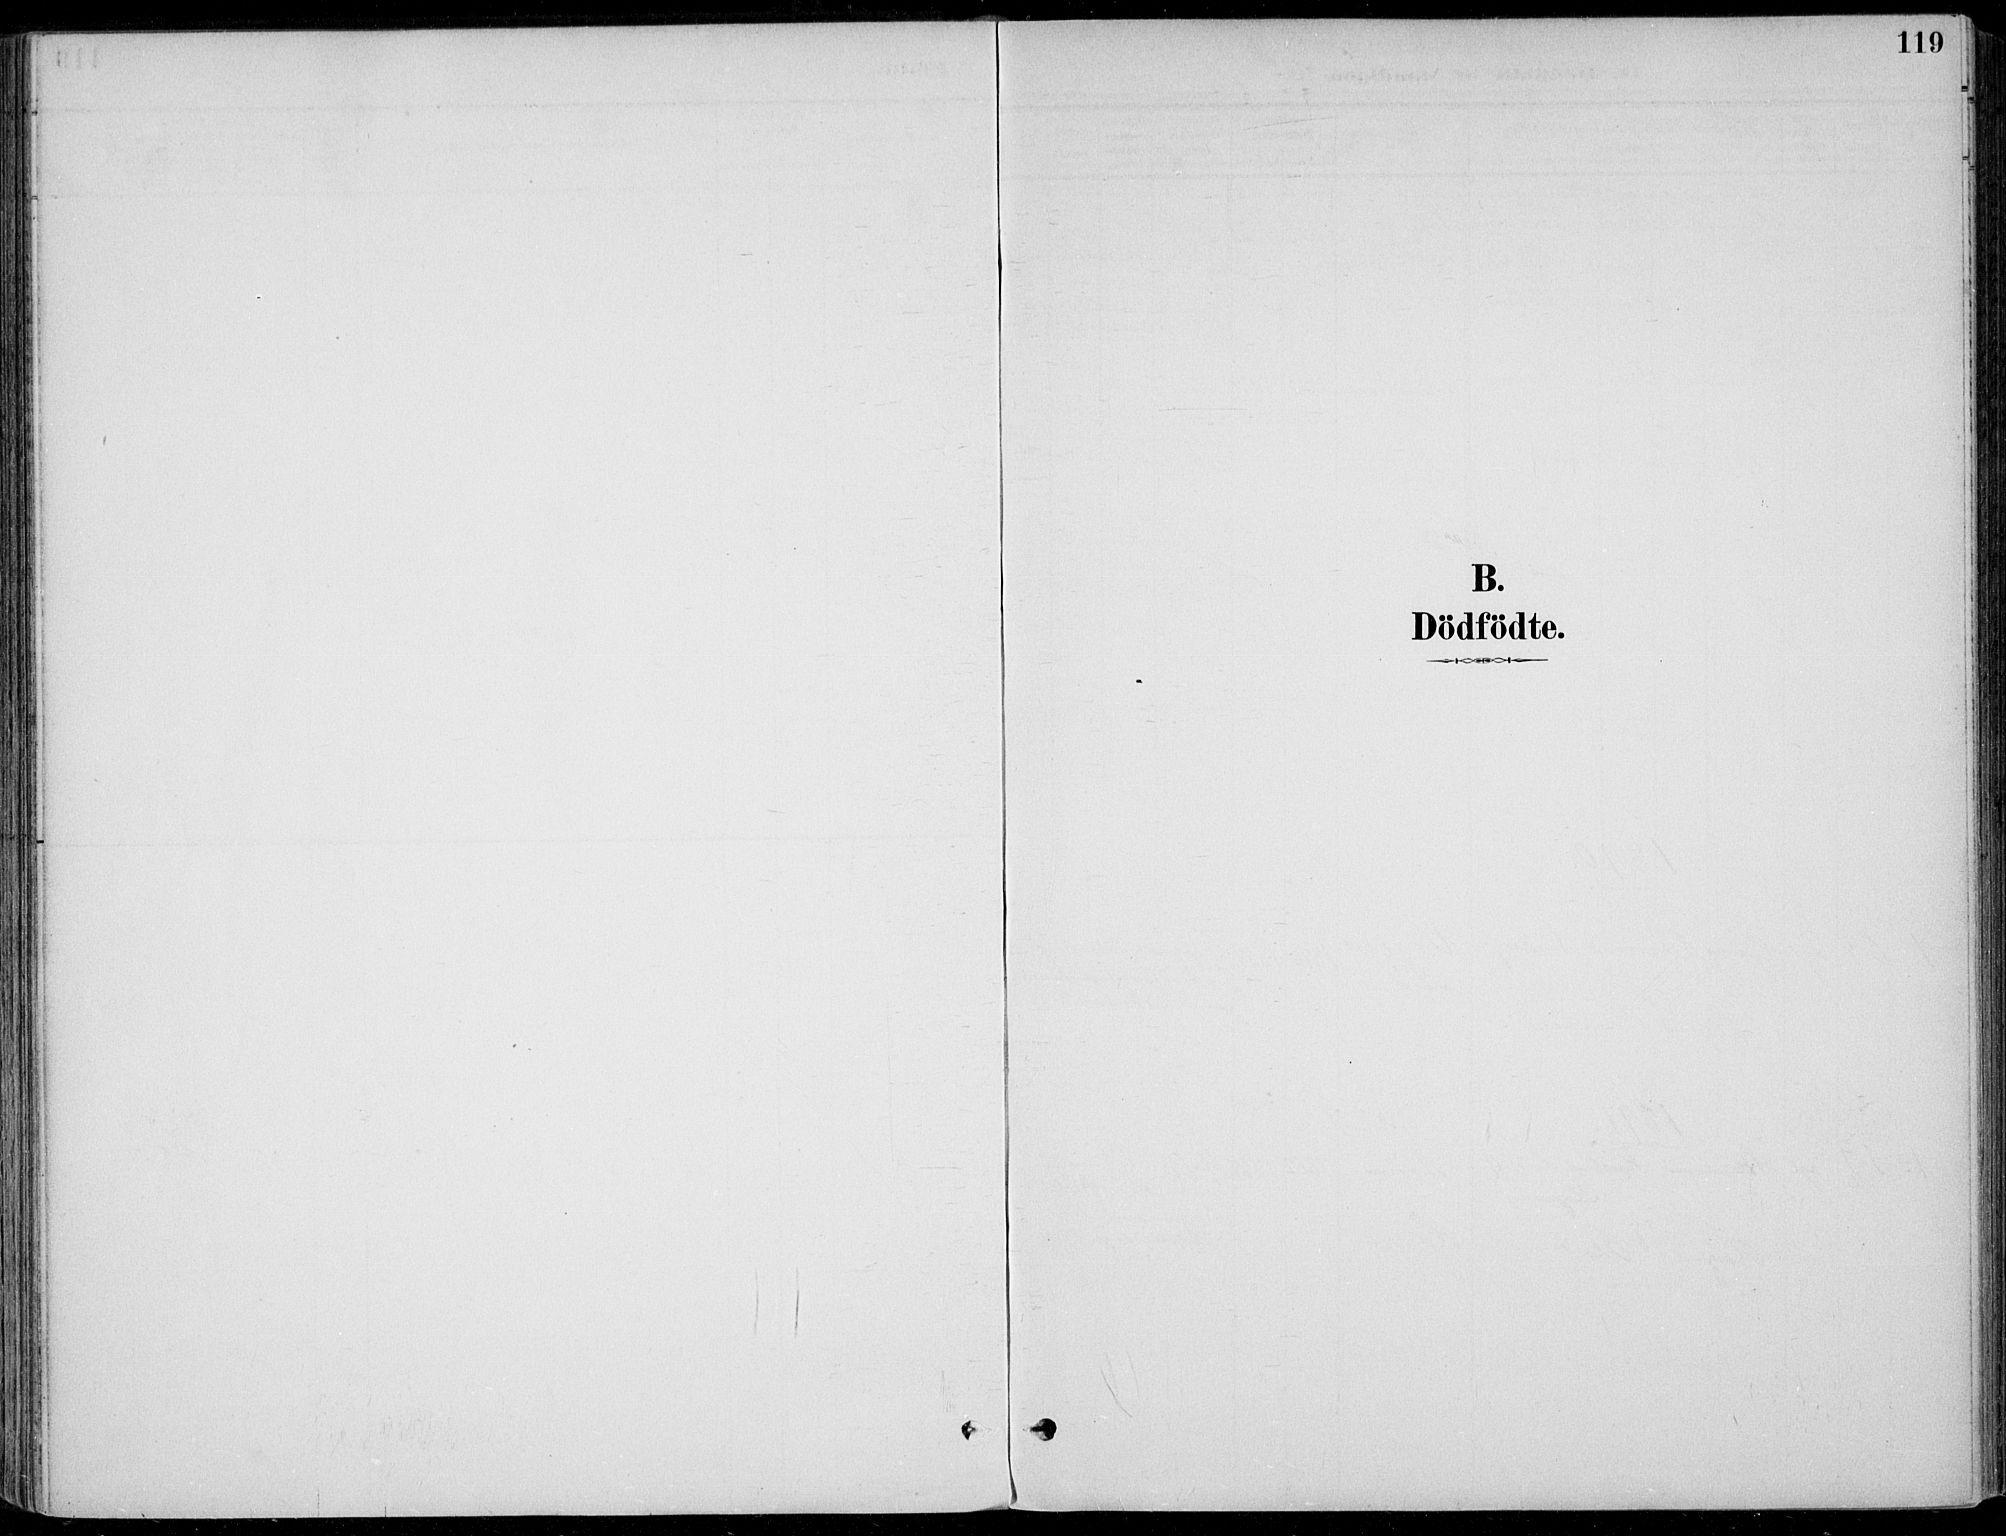 SAKO, Sigdal kirkebøker, F/Fb/L0001: Ministerialbok nr. II 1, 1888-1900, s. 119